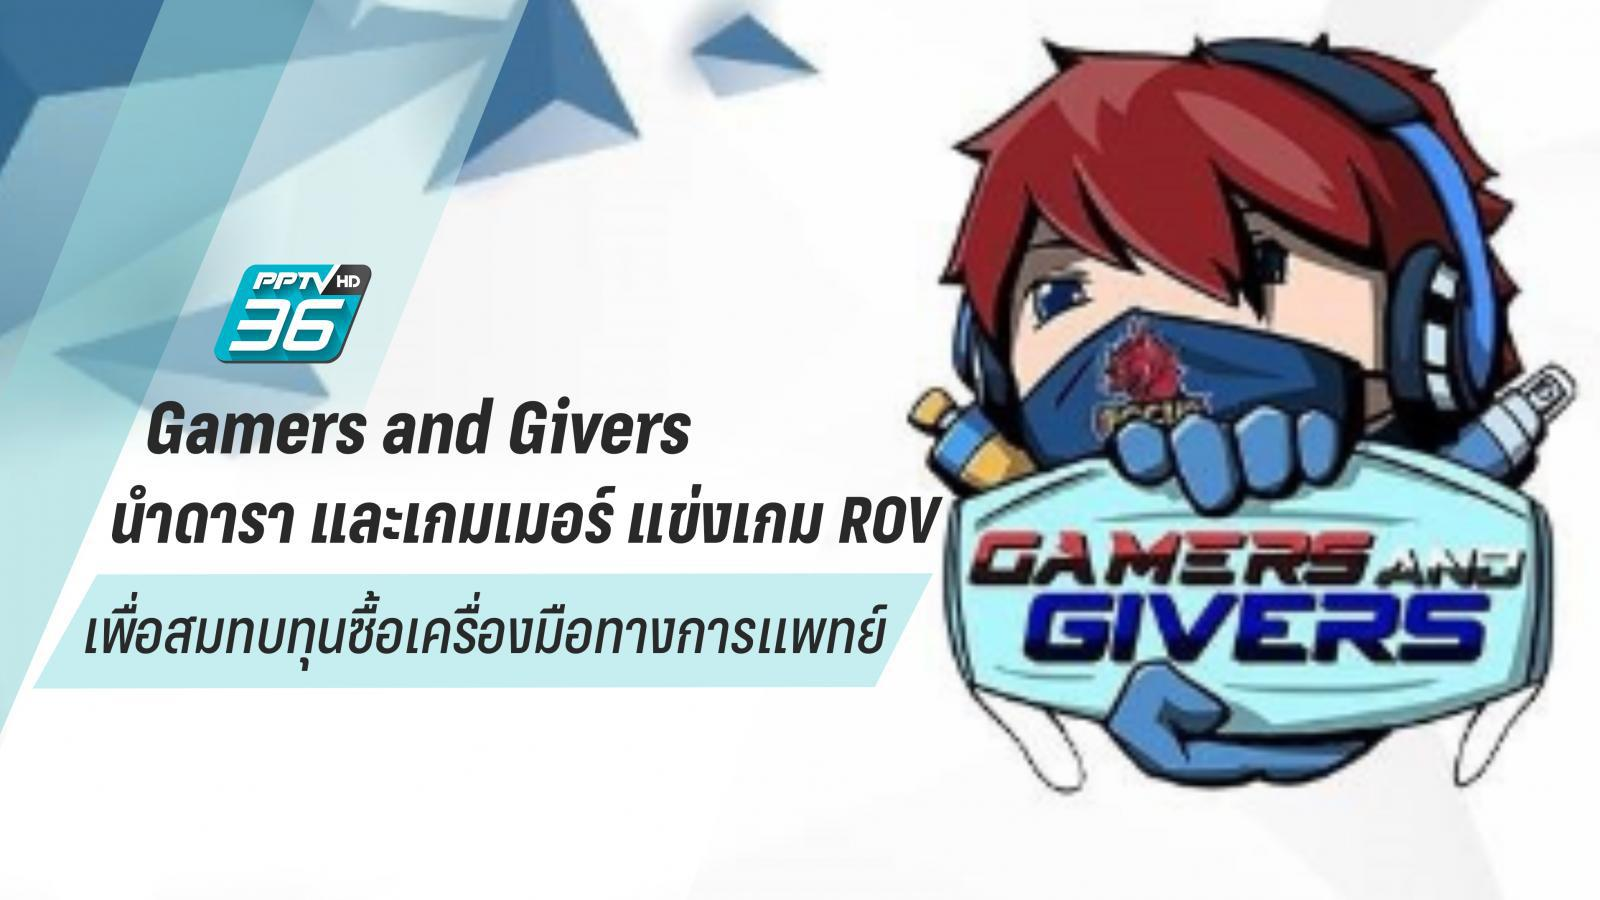 Gamers and Givers นำทัพดารา และเกมเมอร์  แข่งเกม RoV เพื่อมอบอุปกรณ์ทางการแพทย์แก่โรงพยาบาล